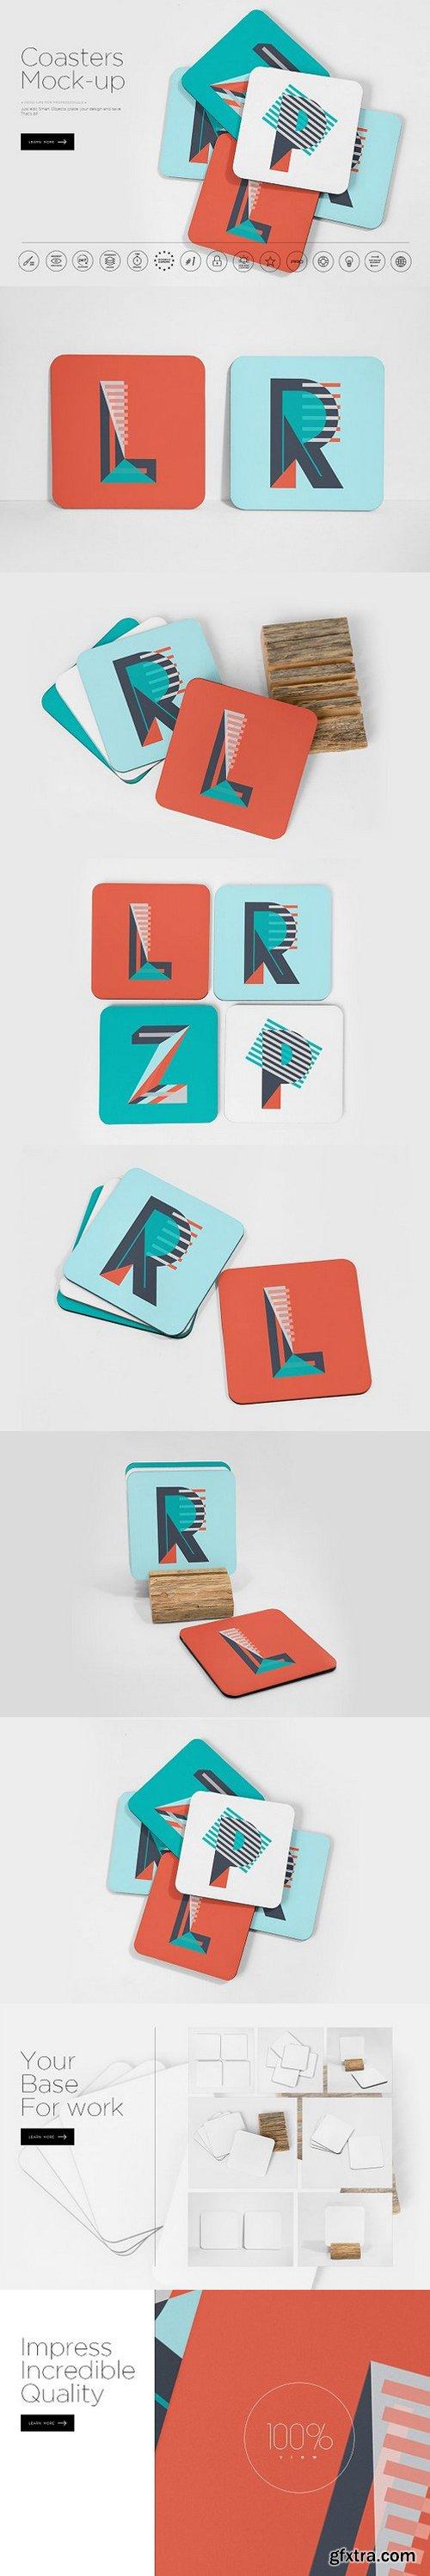 CM - Coasters Mockup 1151728